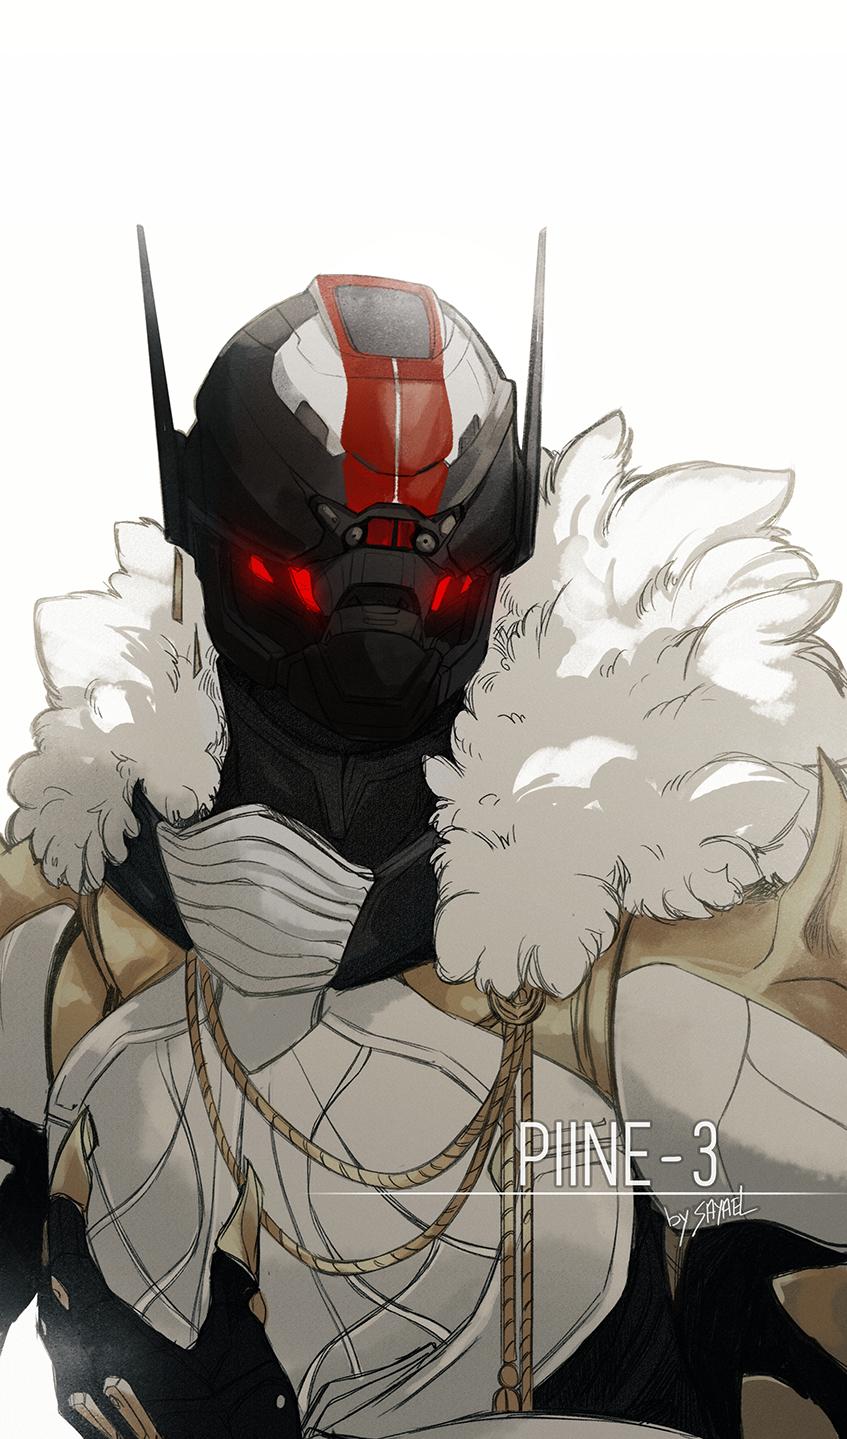 Warlock Piine-3